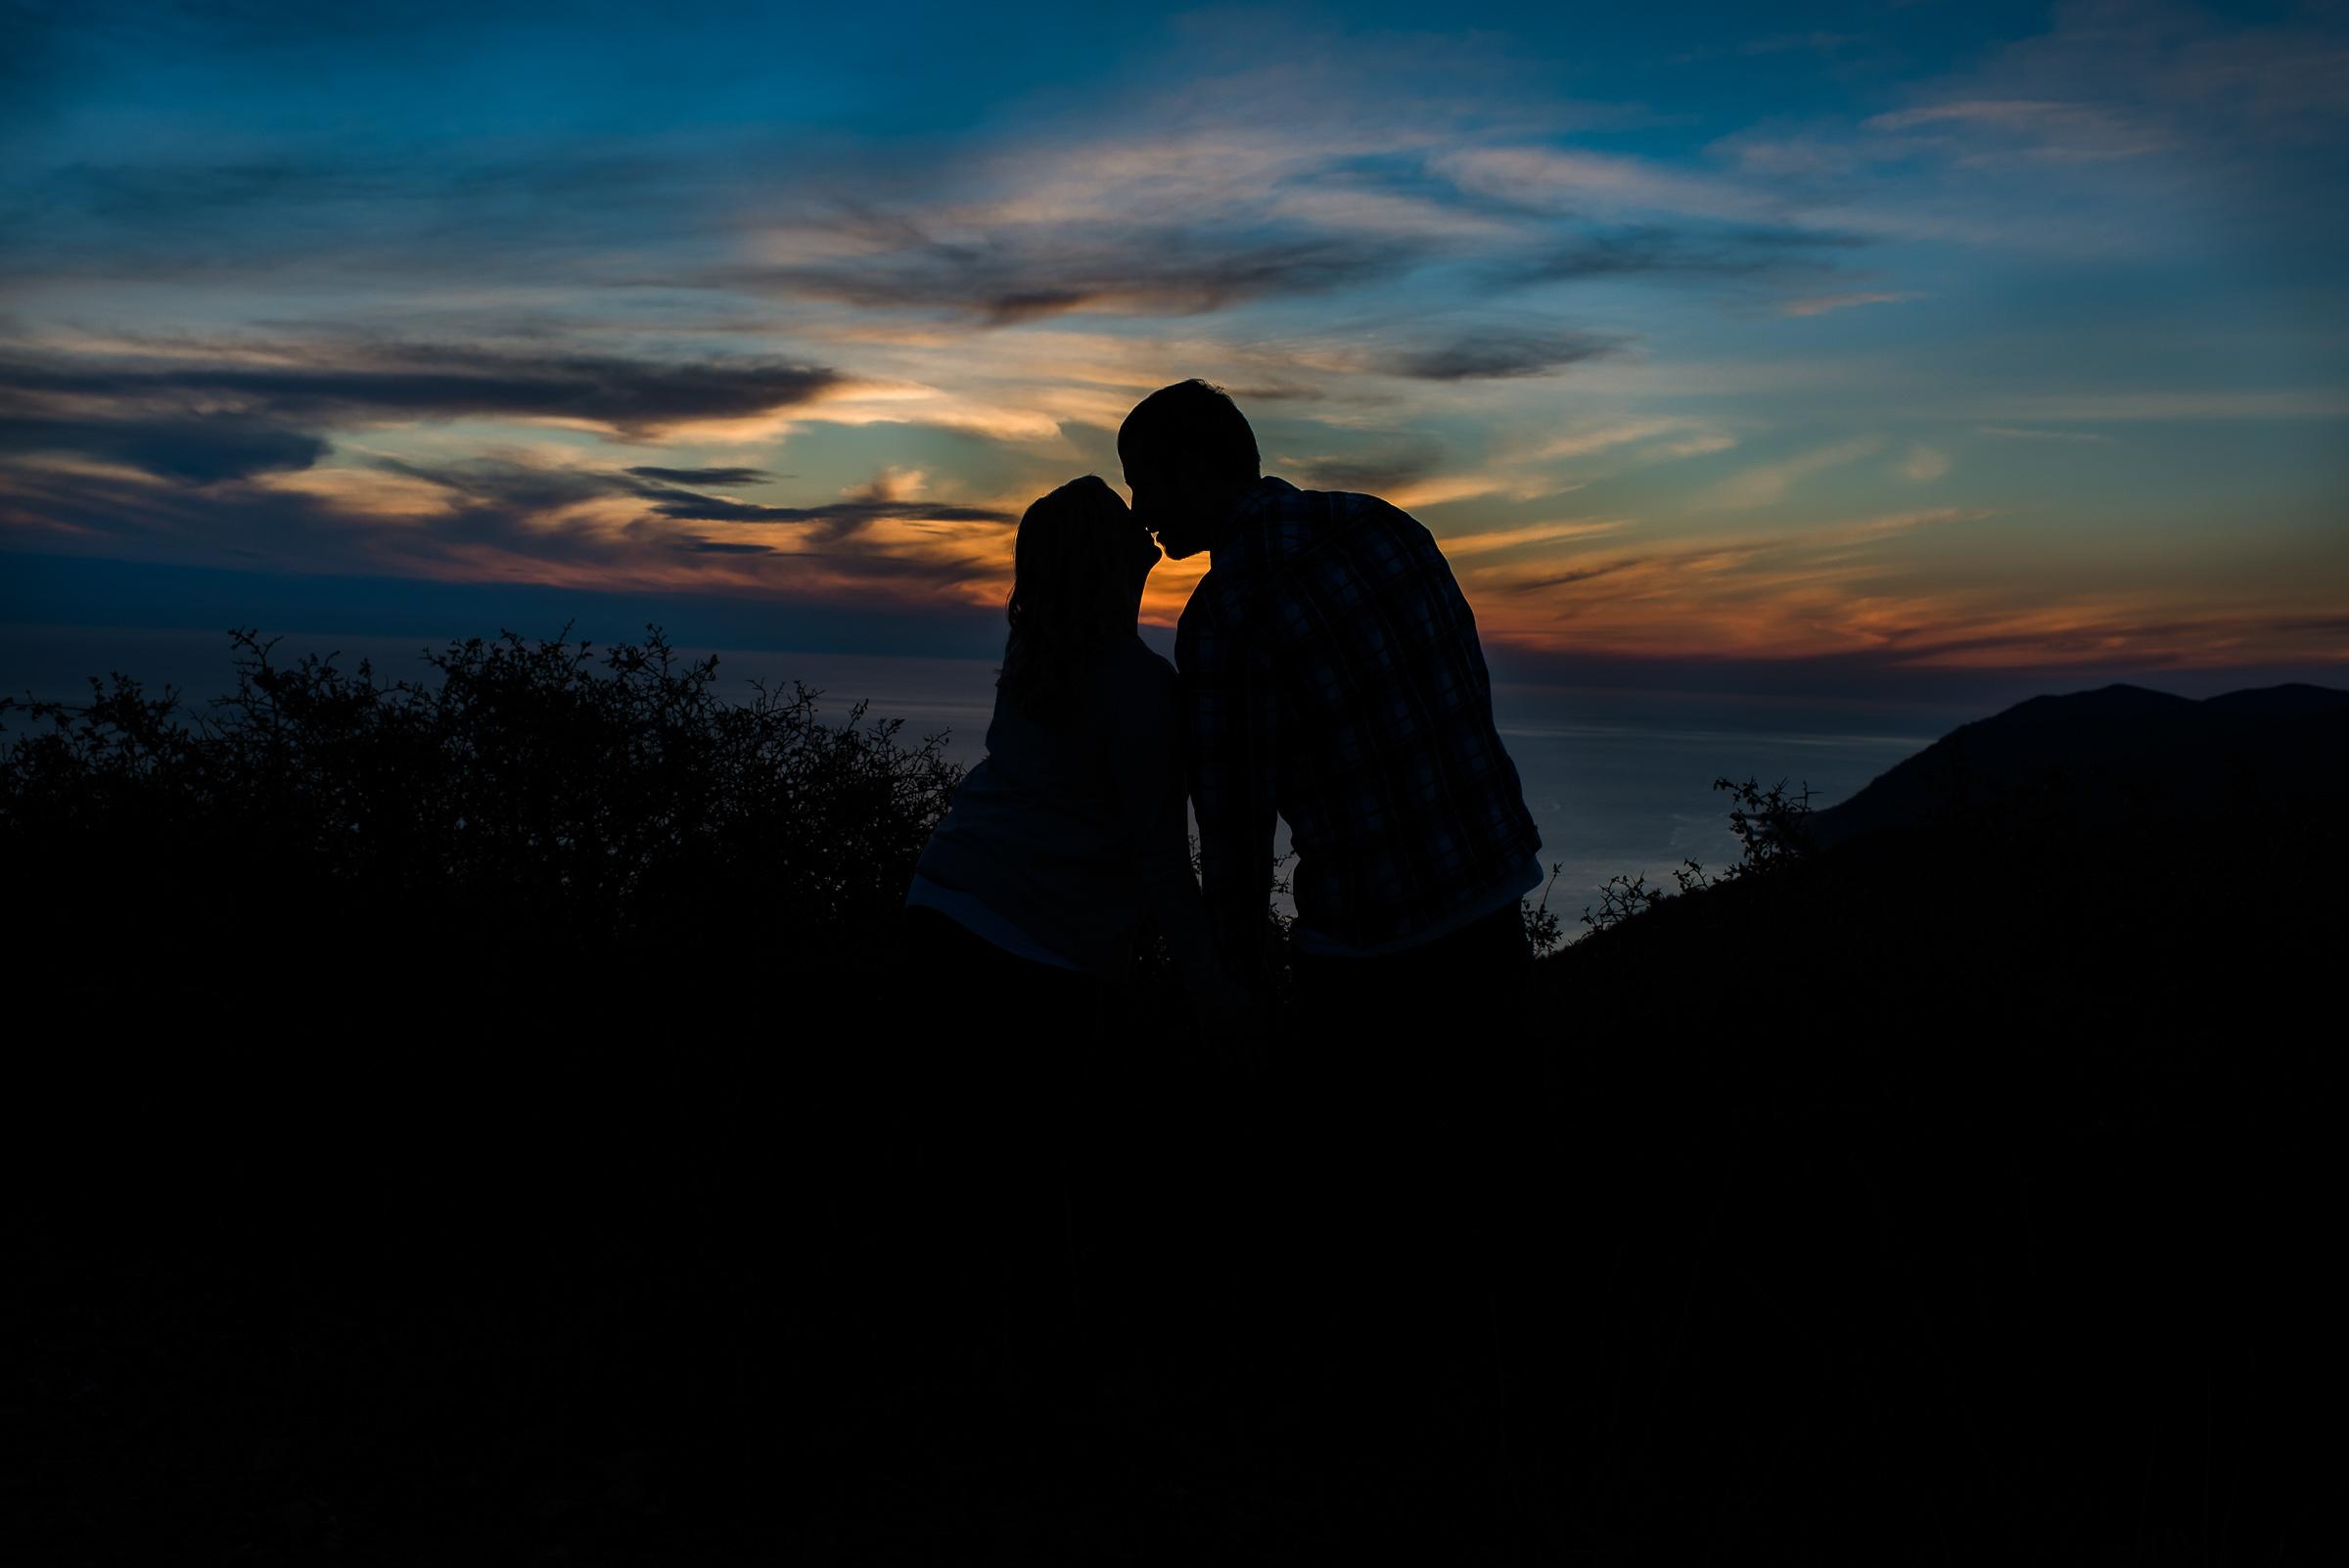 HumboldtCountyEngagementPhotographerParky'sPicsNick&Larissa-19.JPG